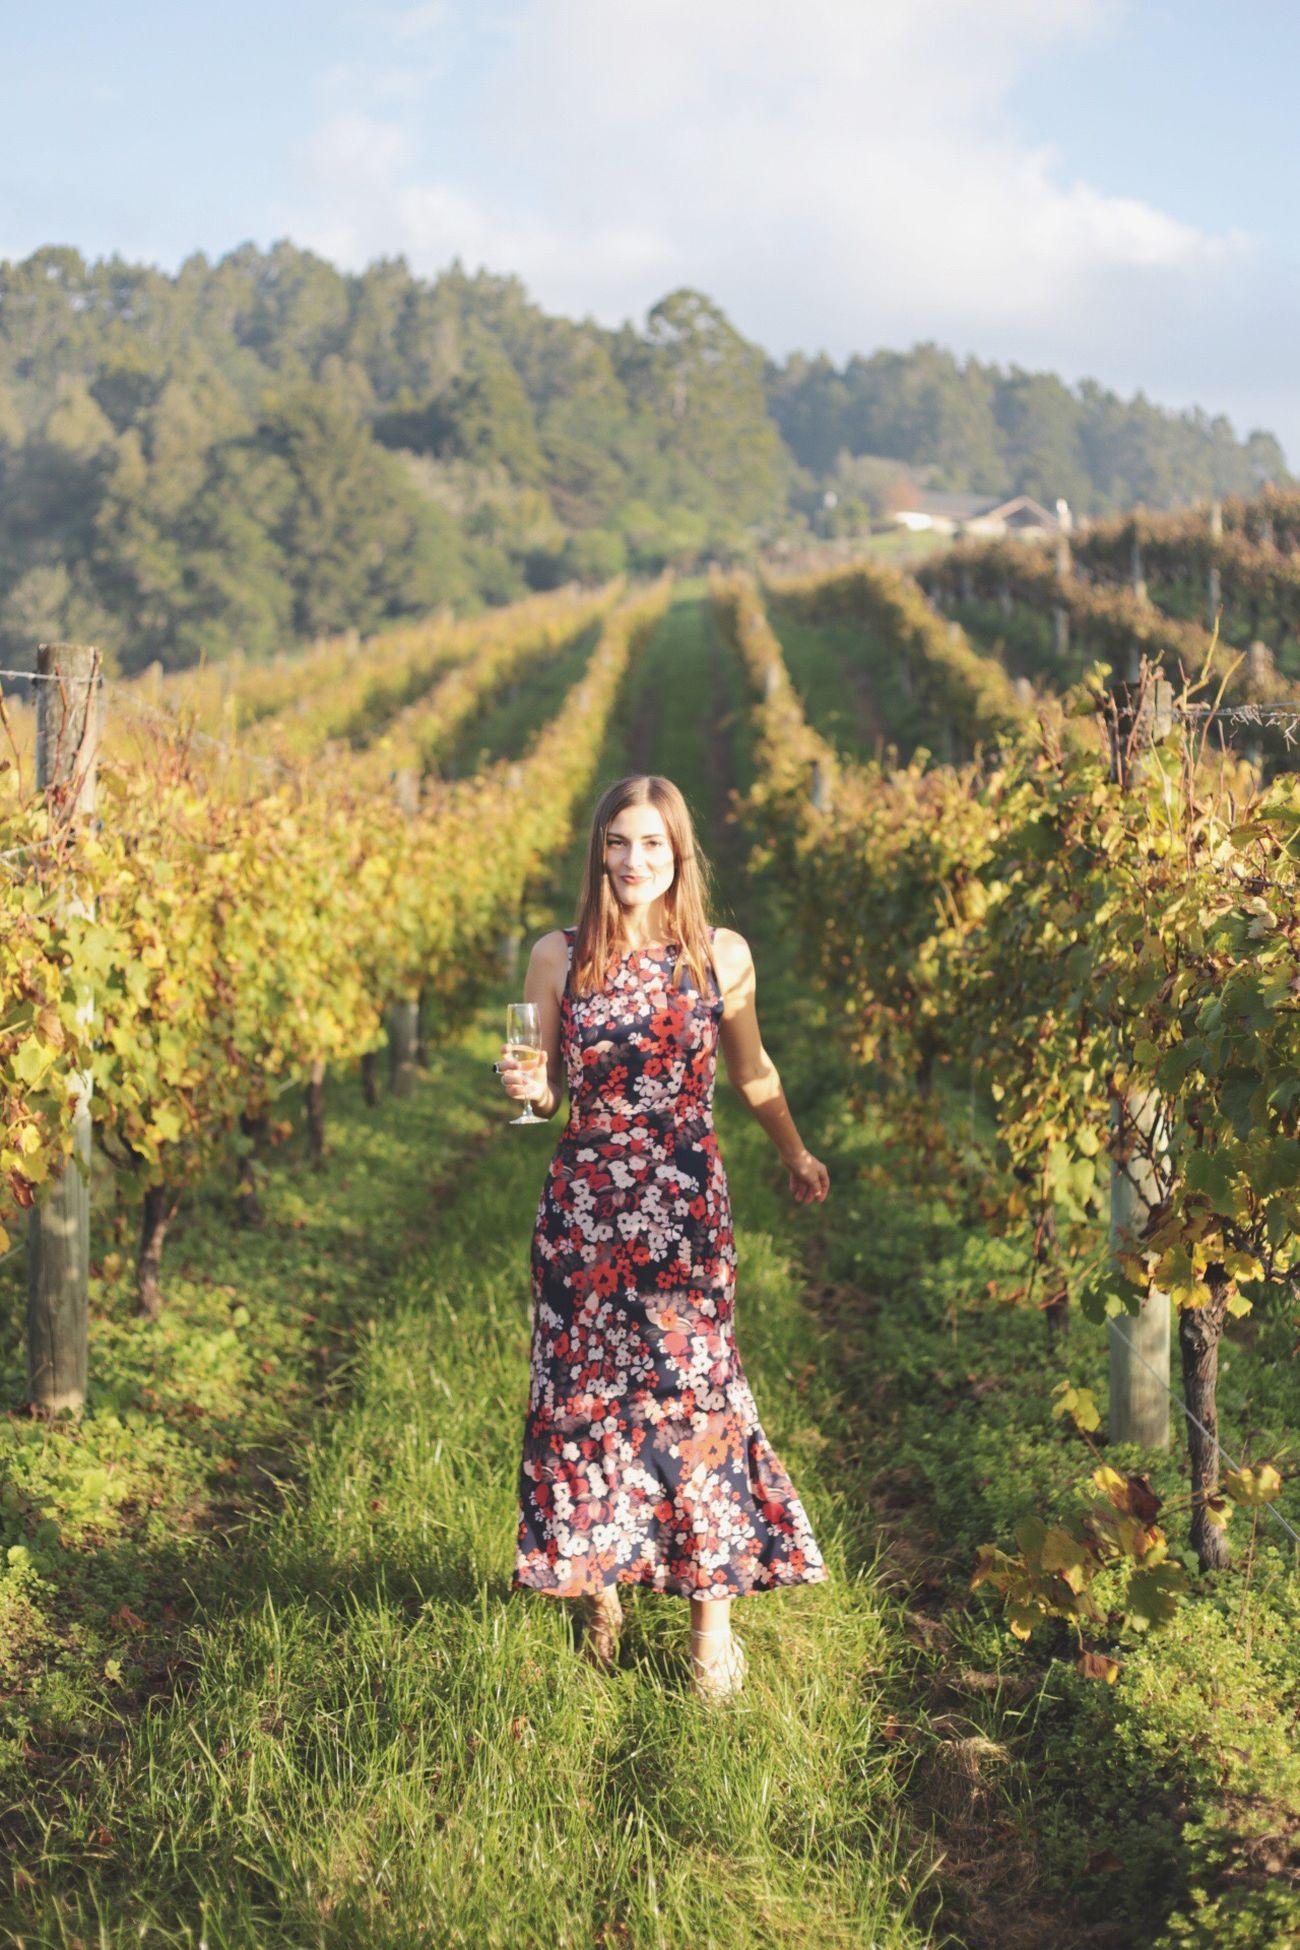 Vineyard Young Women One Person Grass Nature Wine New Zealand Matakana  Outdoors Wedding